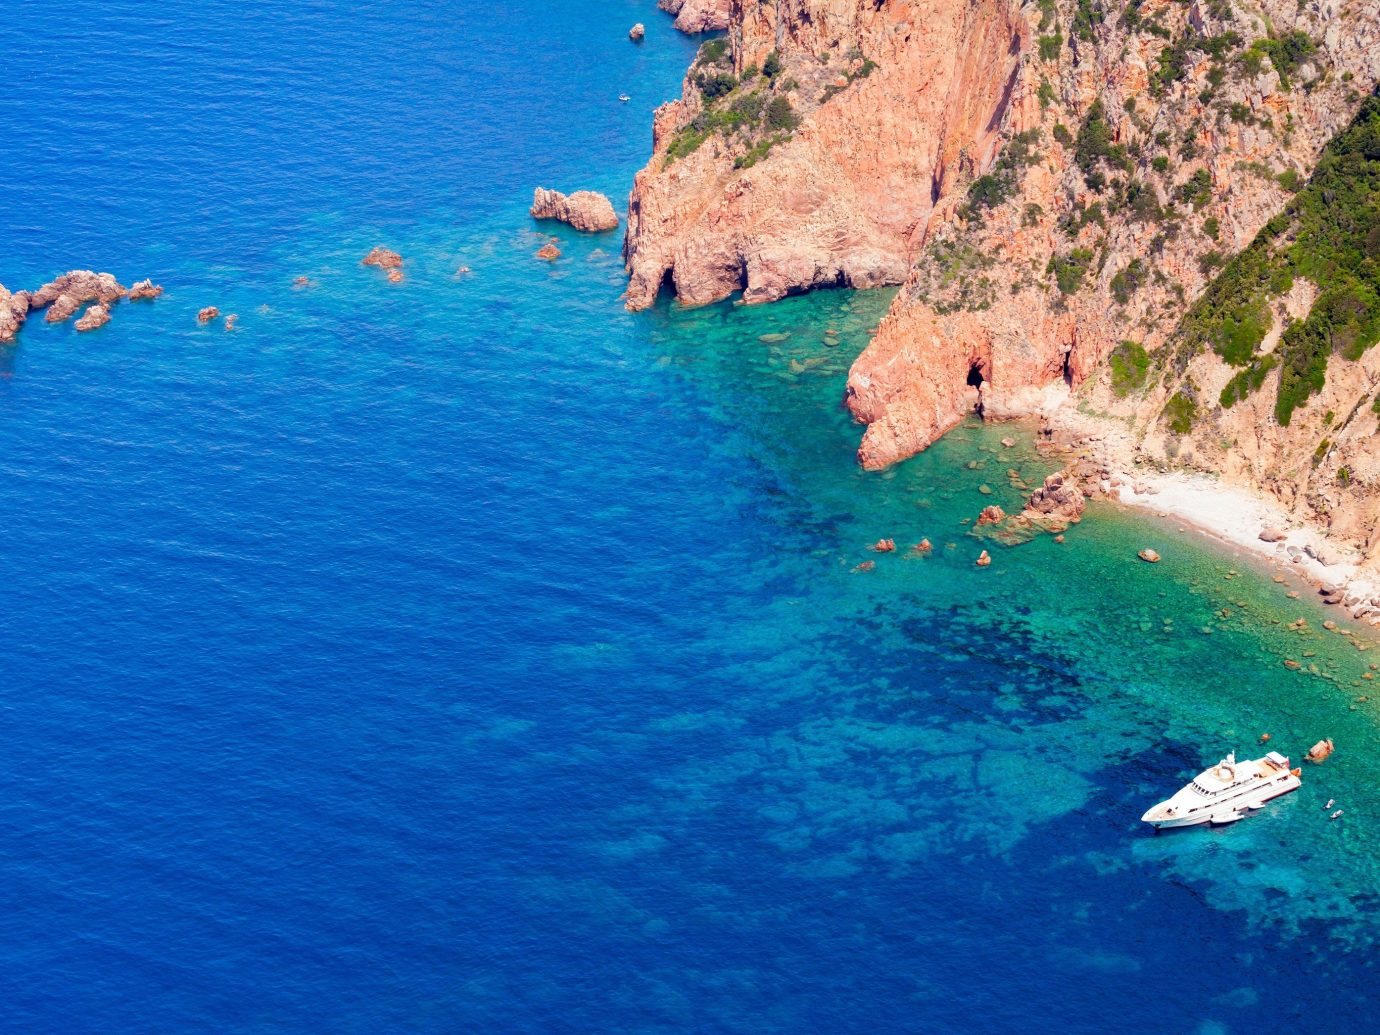 Trip Ideas water water sport Sea Coast cliff Ocean terrain swimming Nature Sport cape bay blue islet wave